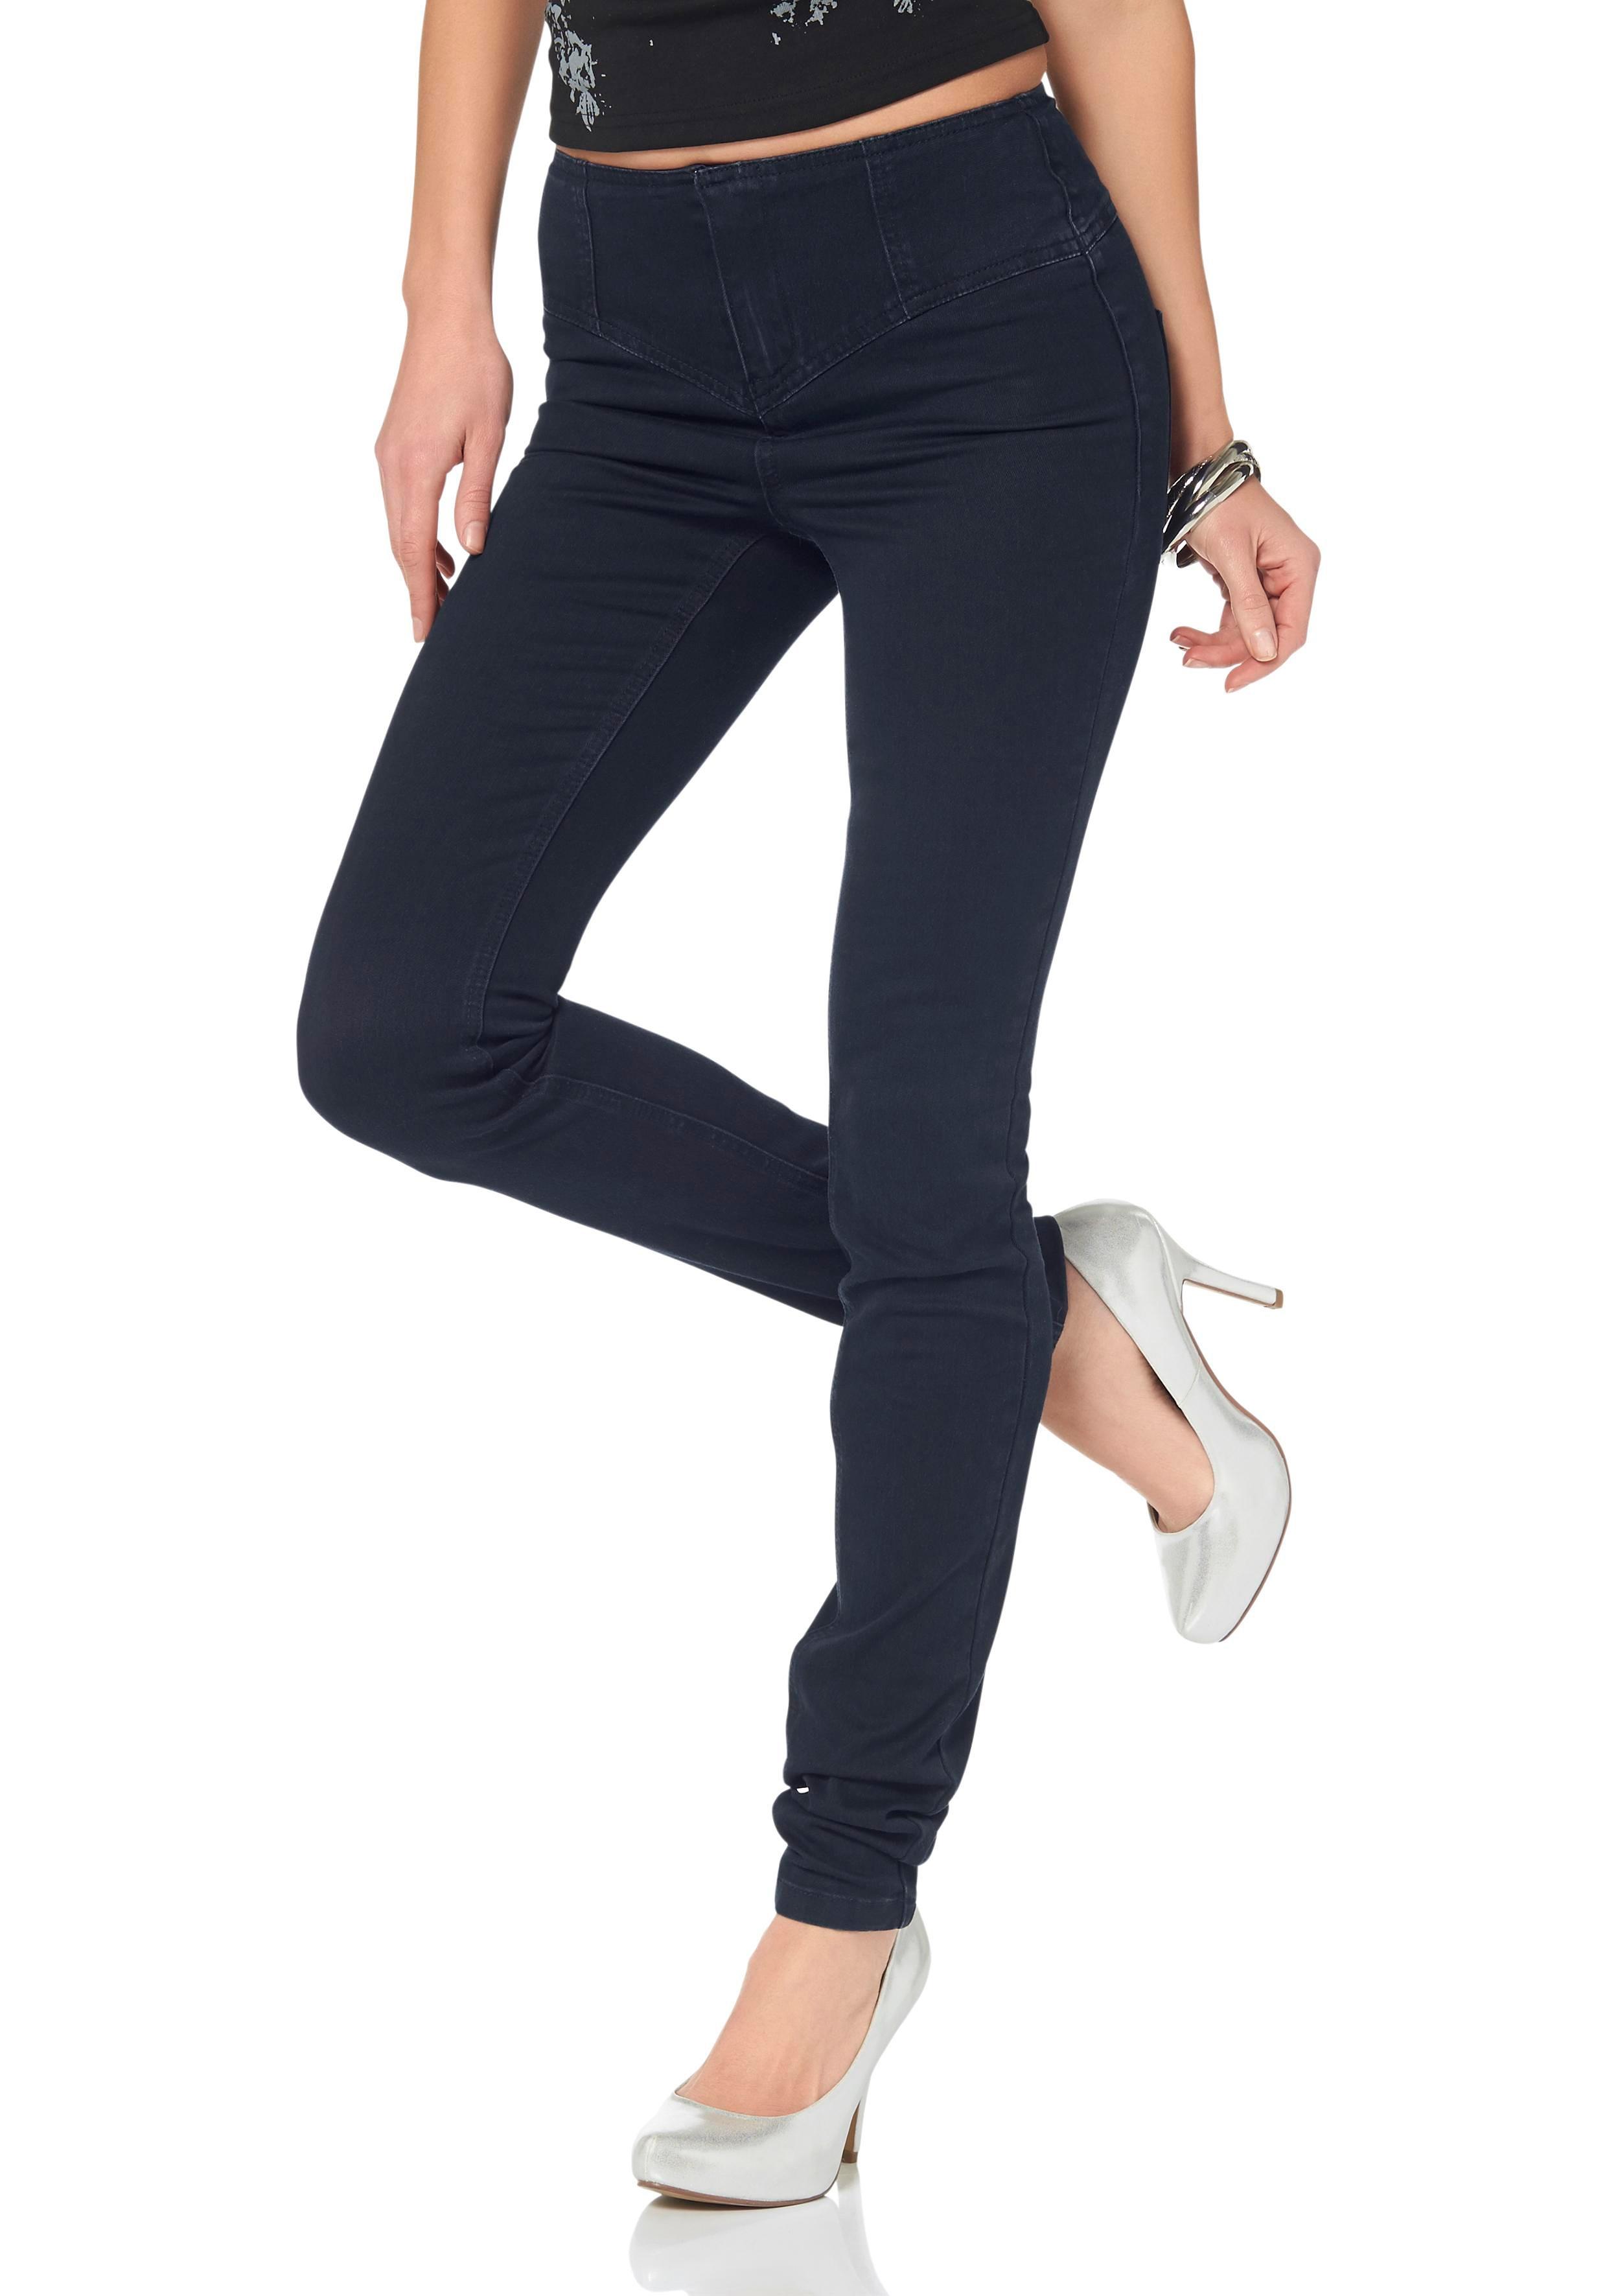 ARIZONA Skinny-jeans Ultimate Shaper goedkoop op otto.nl kopen